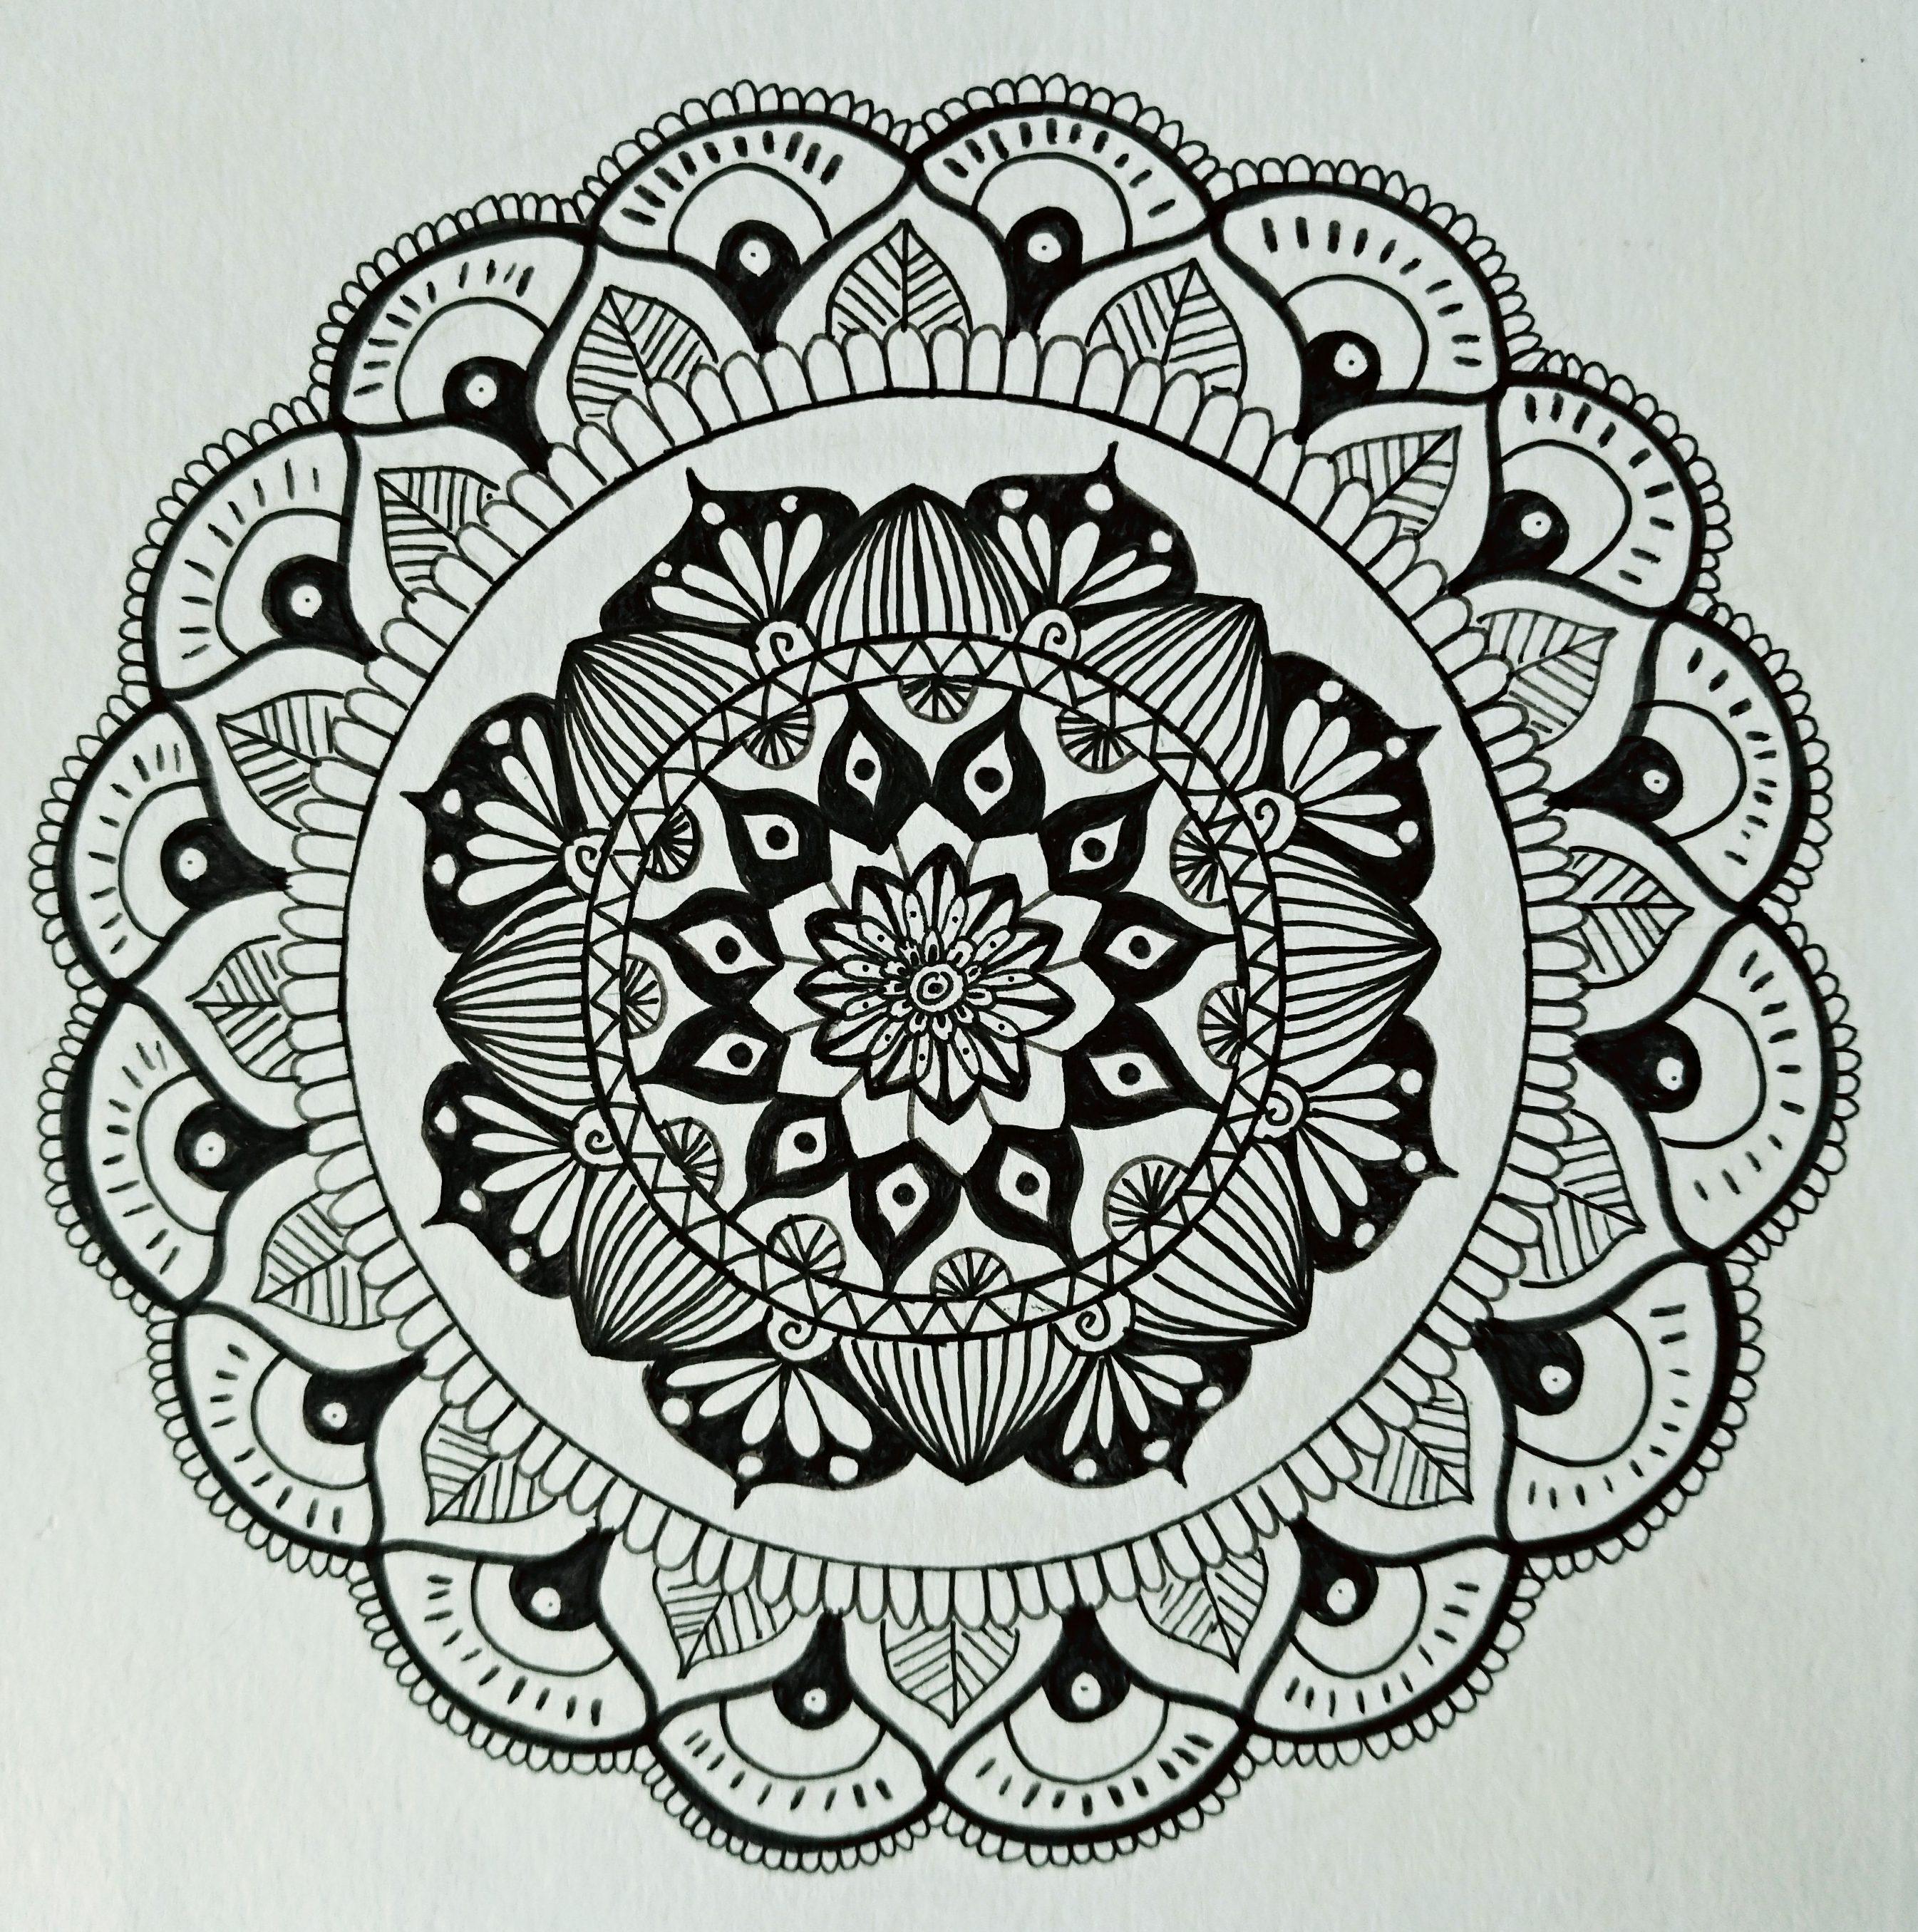 dessin méditatif zen doodle a